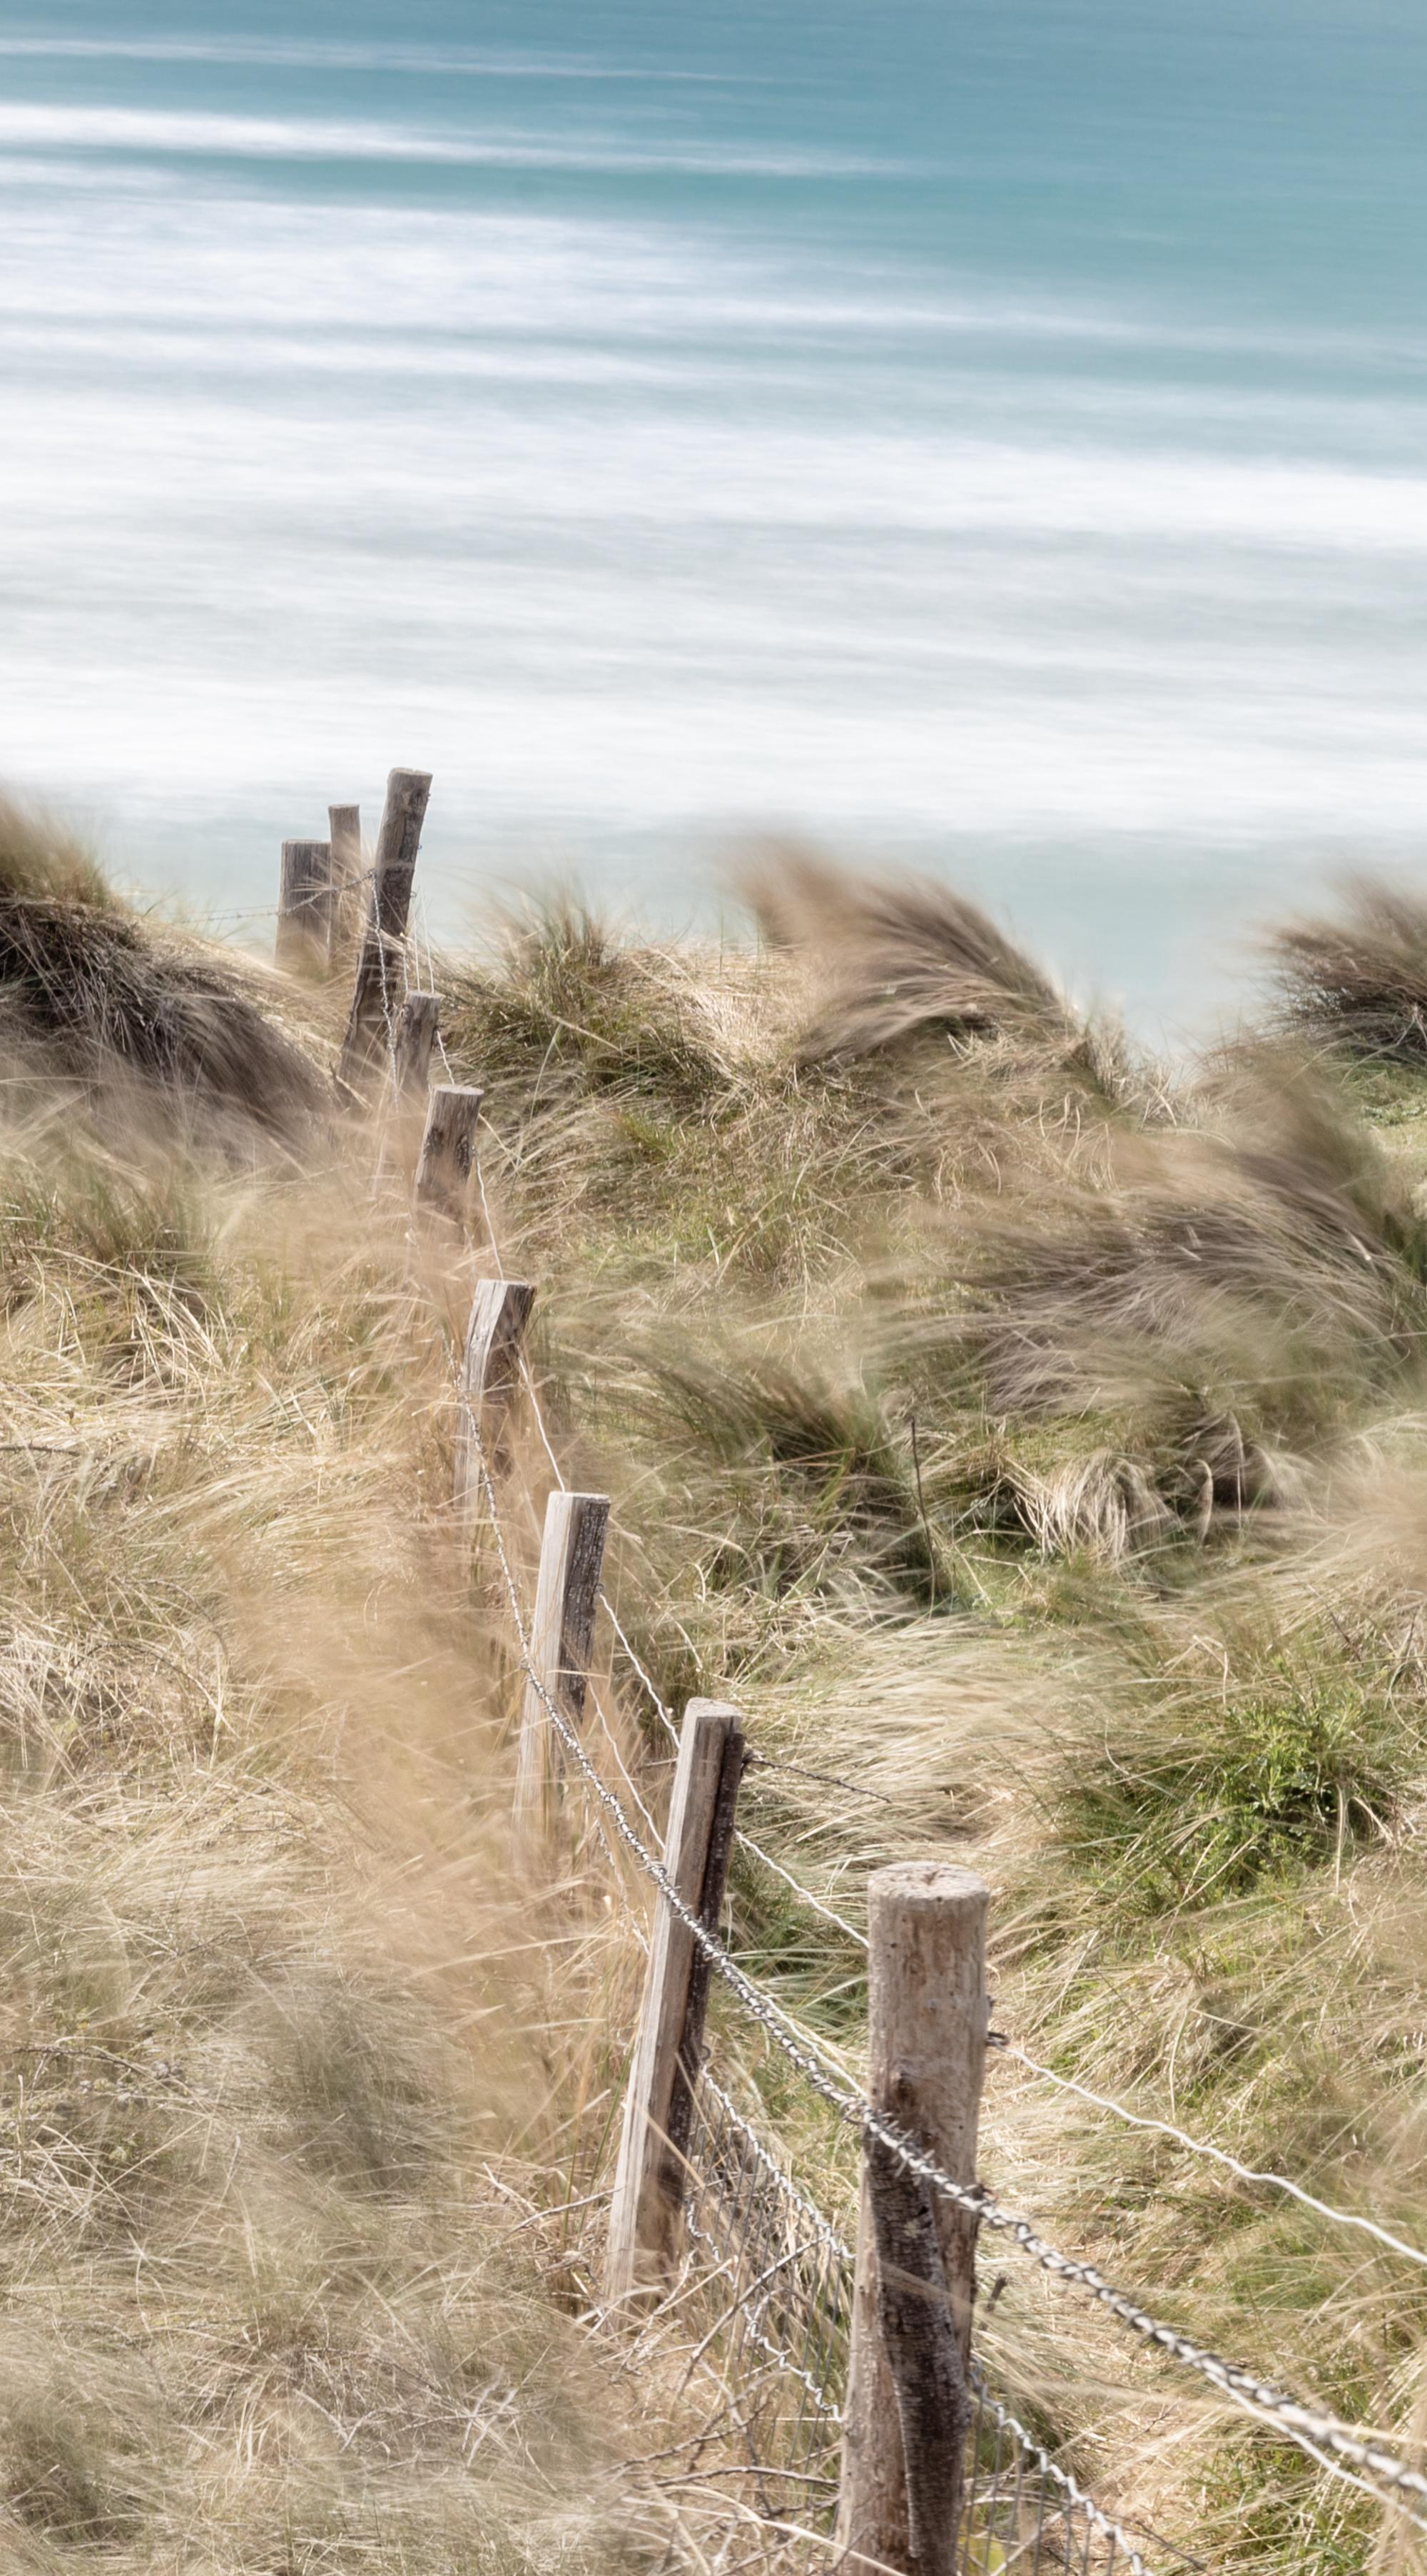 Windy Day By Lindsay Southgate